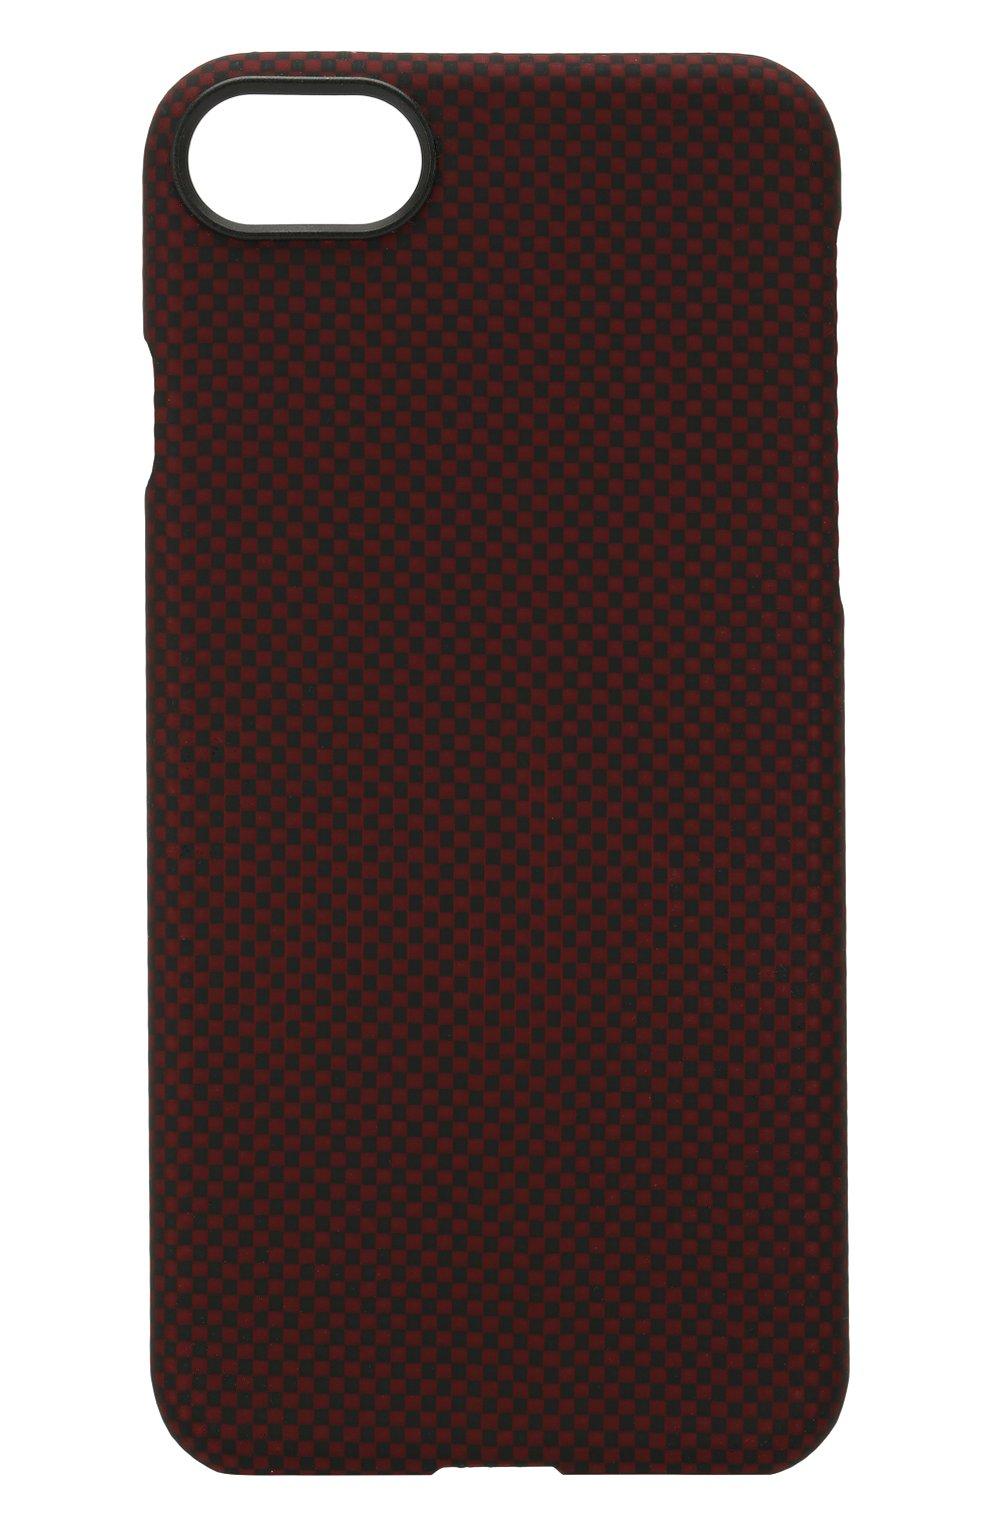 Мужской чехол для iphone 7/8 из кевларовой нити PITAKA красного цвета, арт. KI7004   Фото 1